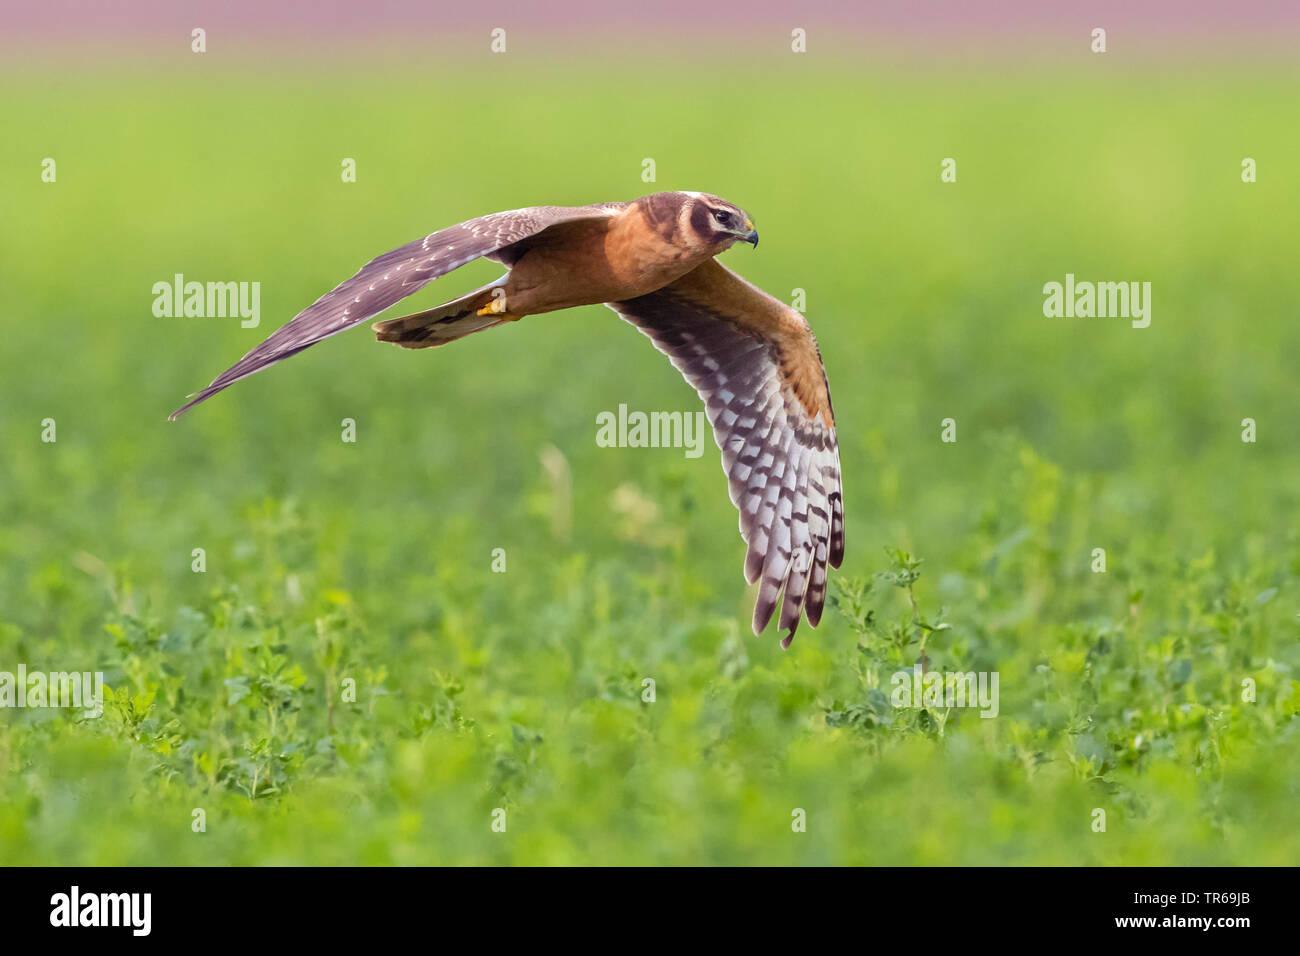 pallid harrier (Circus macrourus), flying, Israel - Stock Image